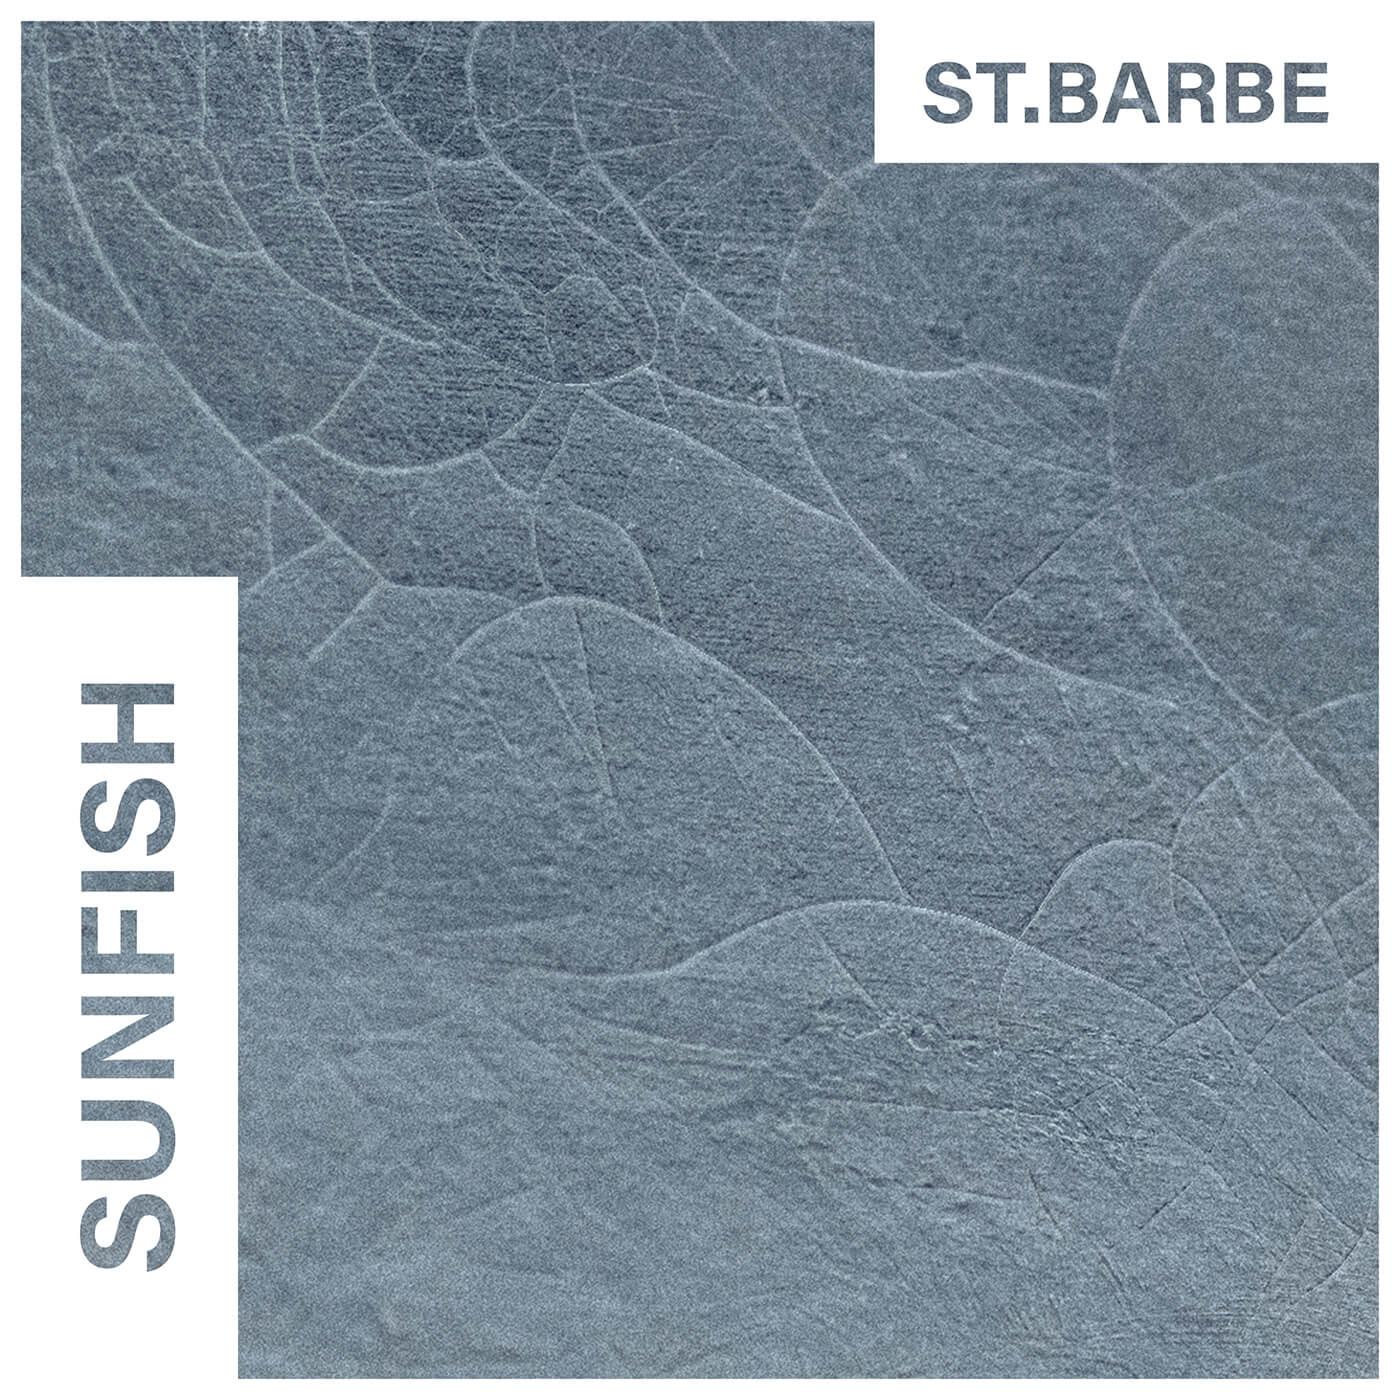 St Barbe - Sunfish